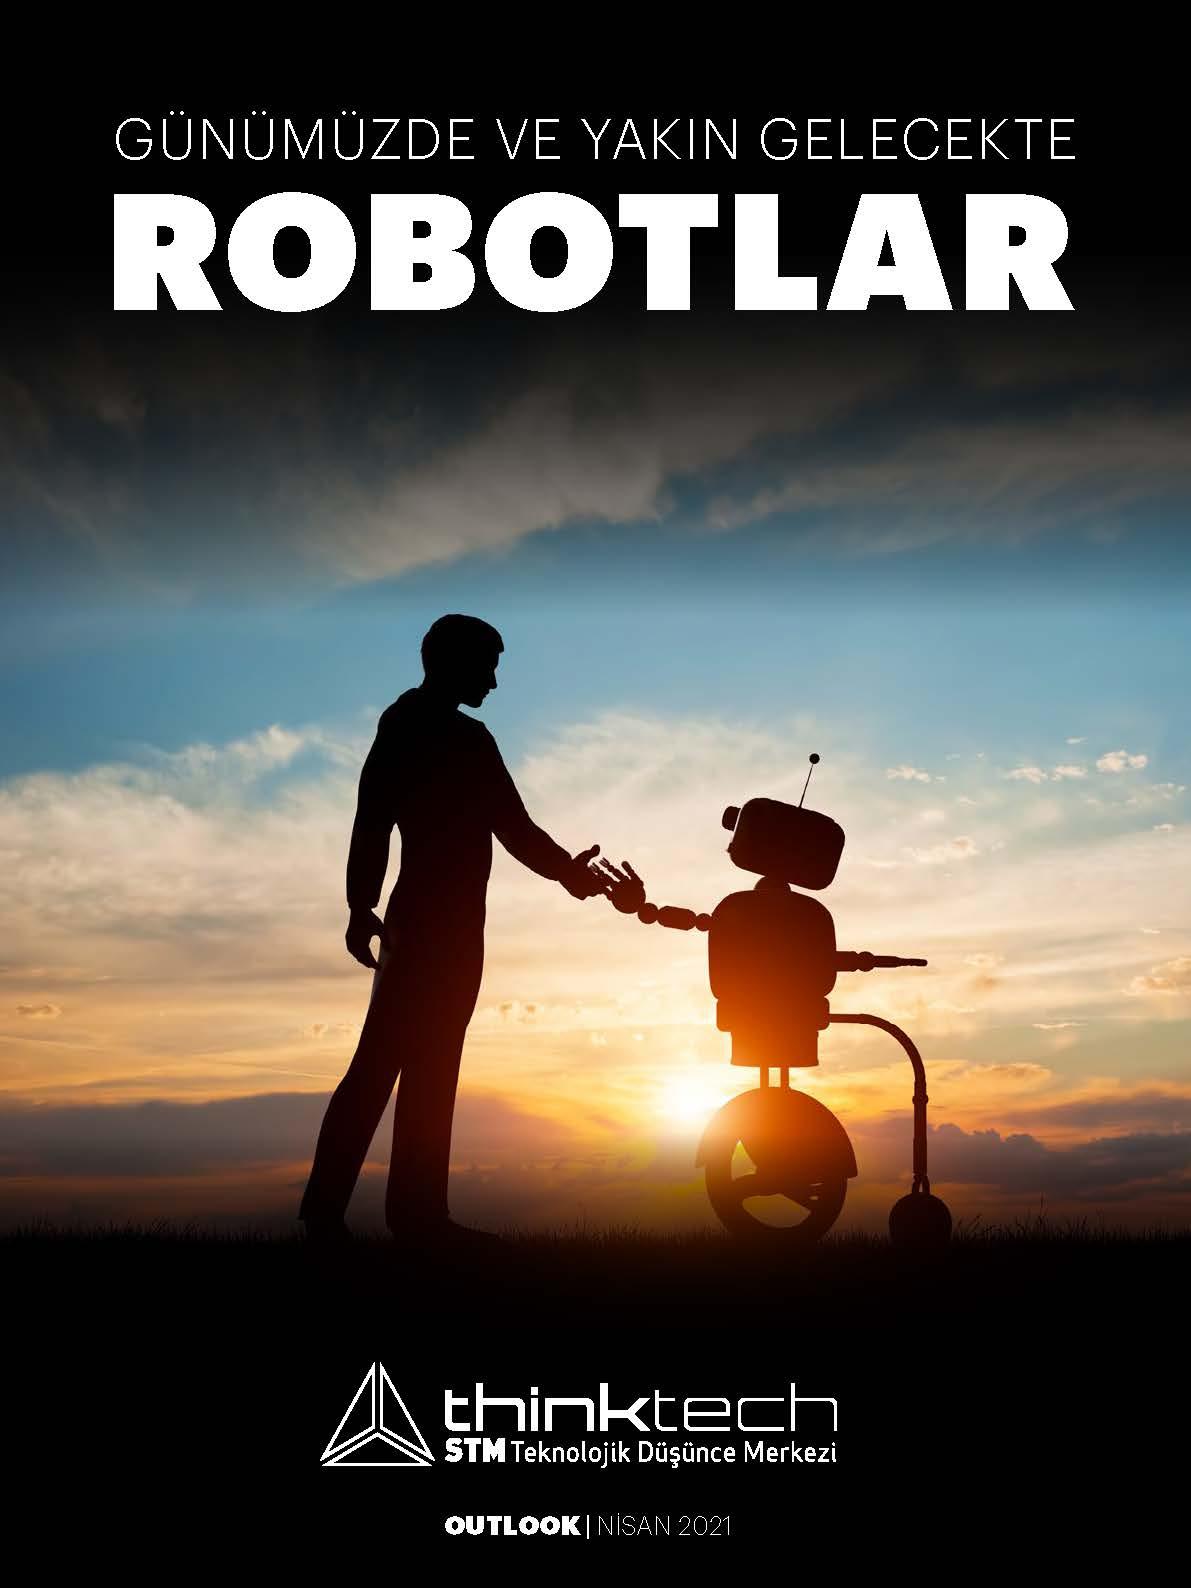 STM THINKTECH OUTLOOK RAPORU YAYIMLANDI: ROBOTLAR İŞBAŞINDA!